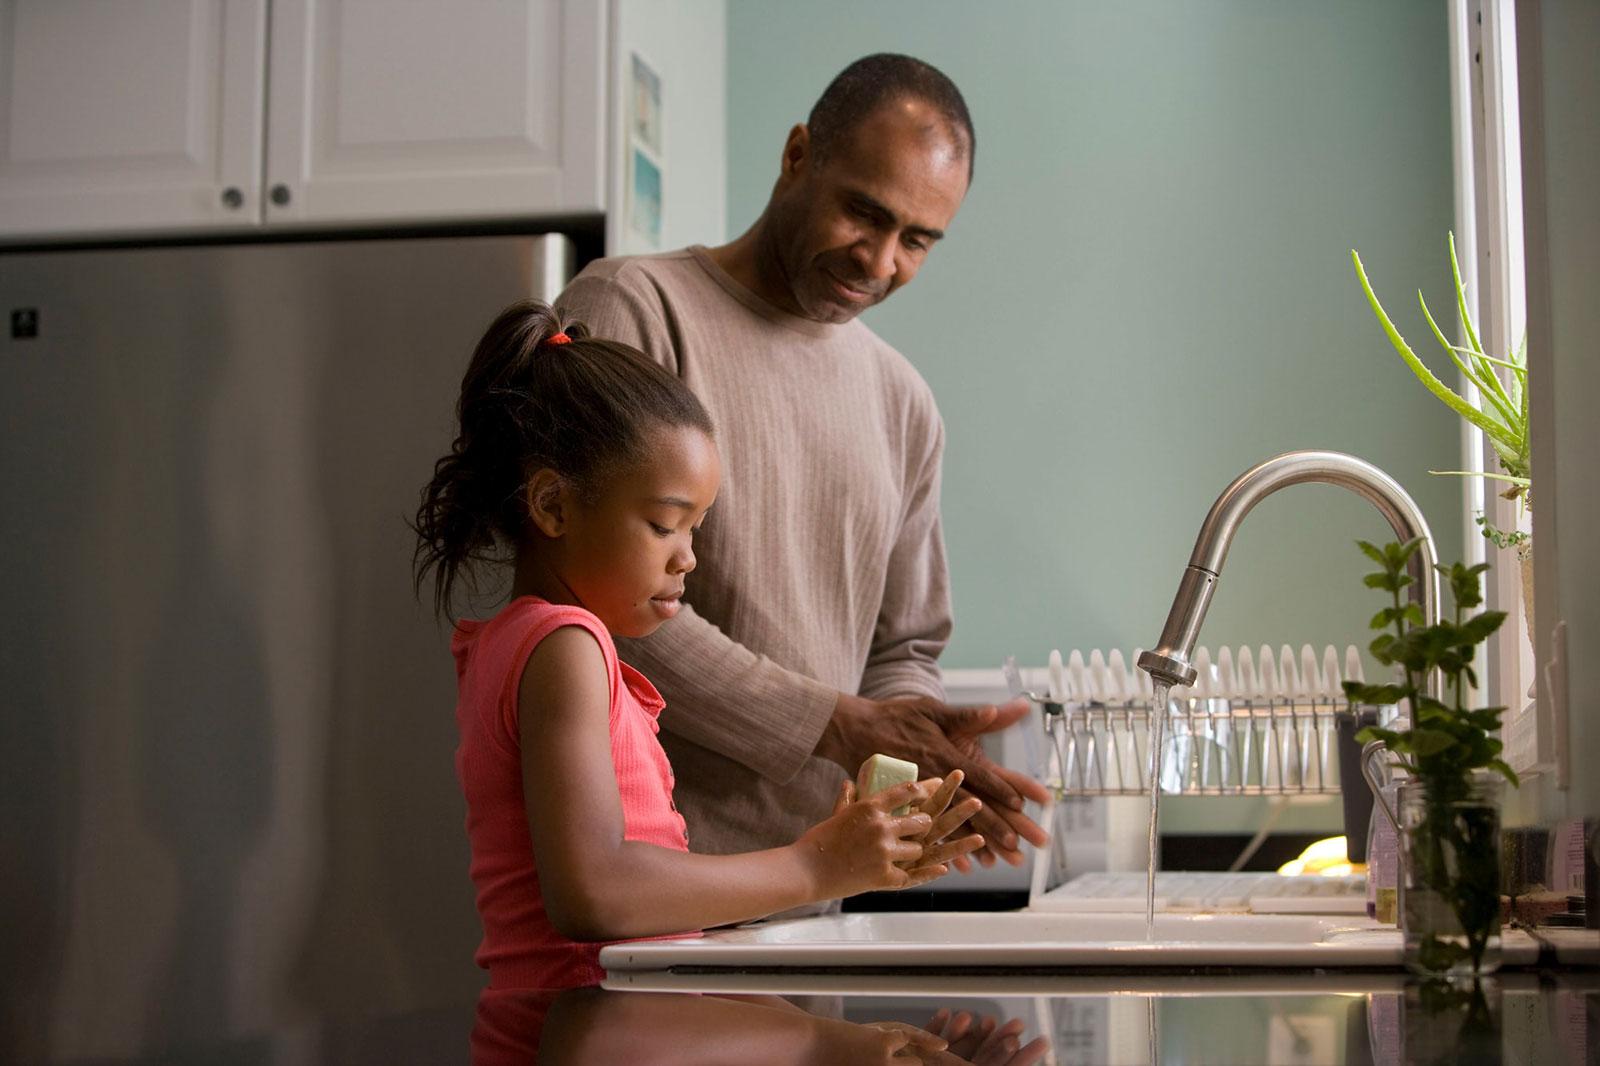 10 Internet Safety Tips for Parents